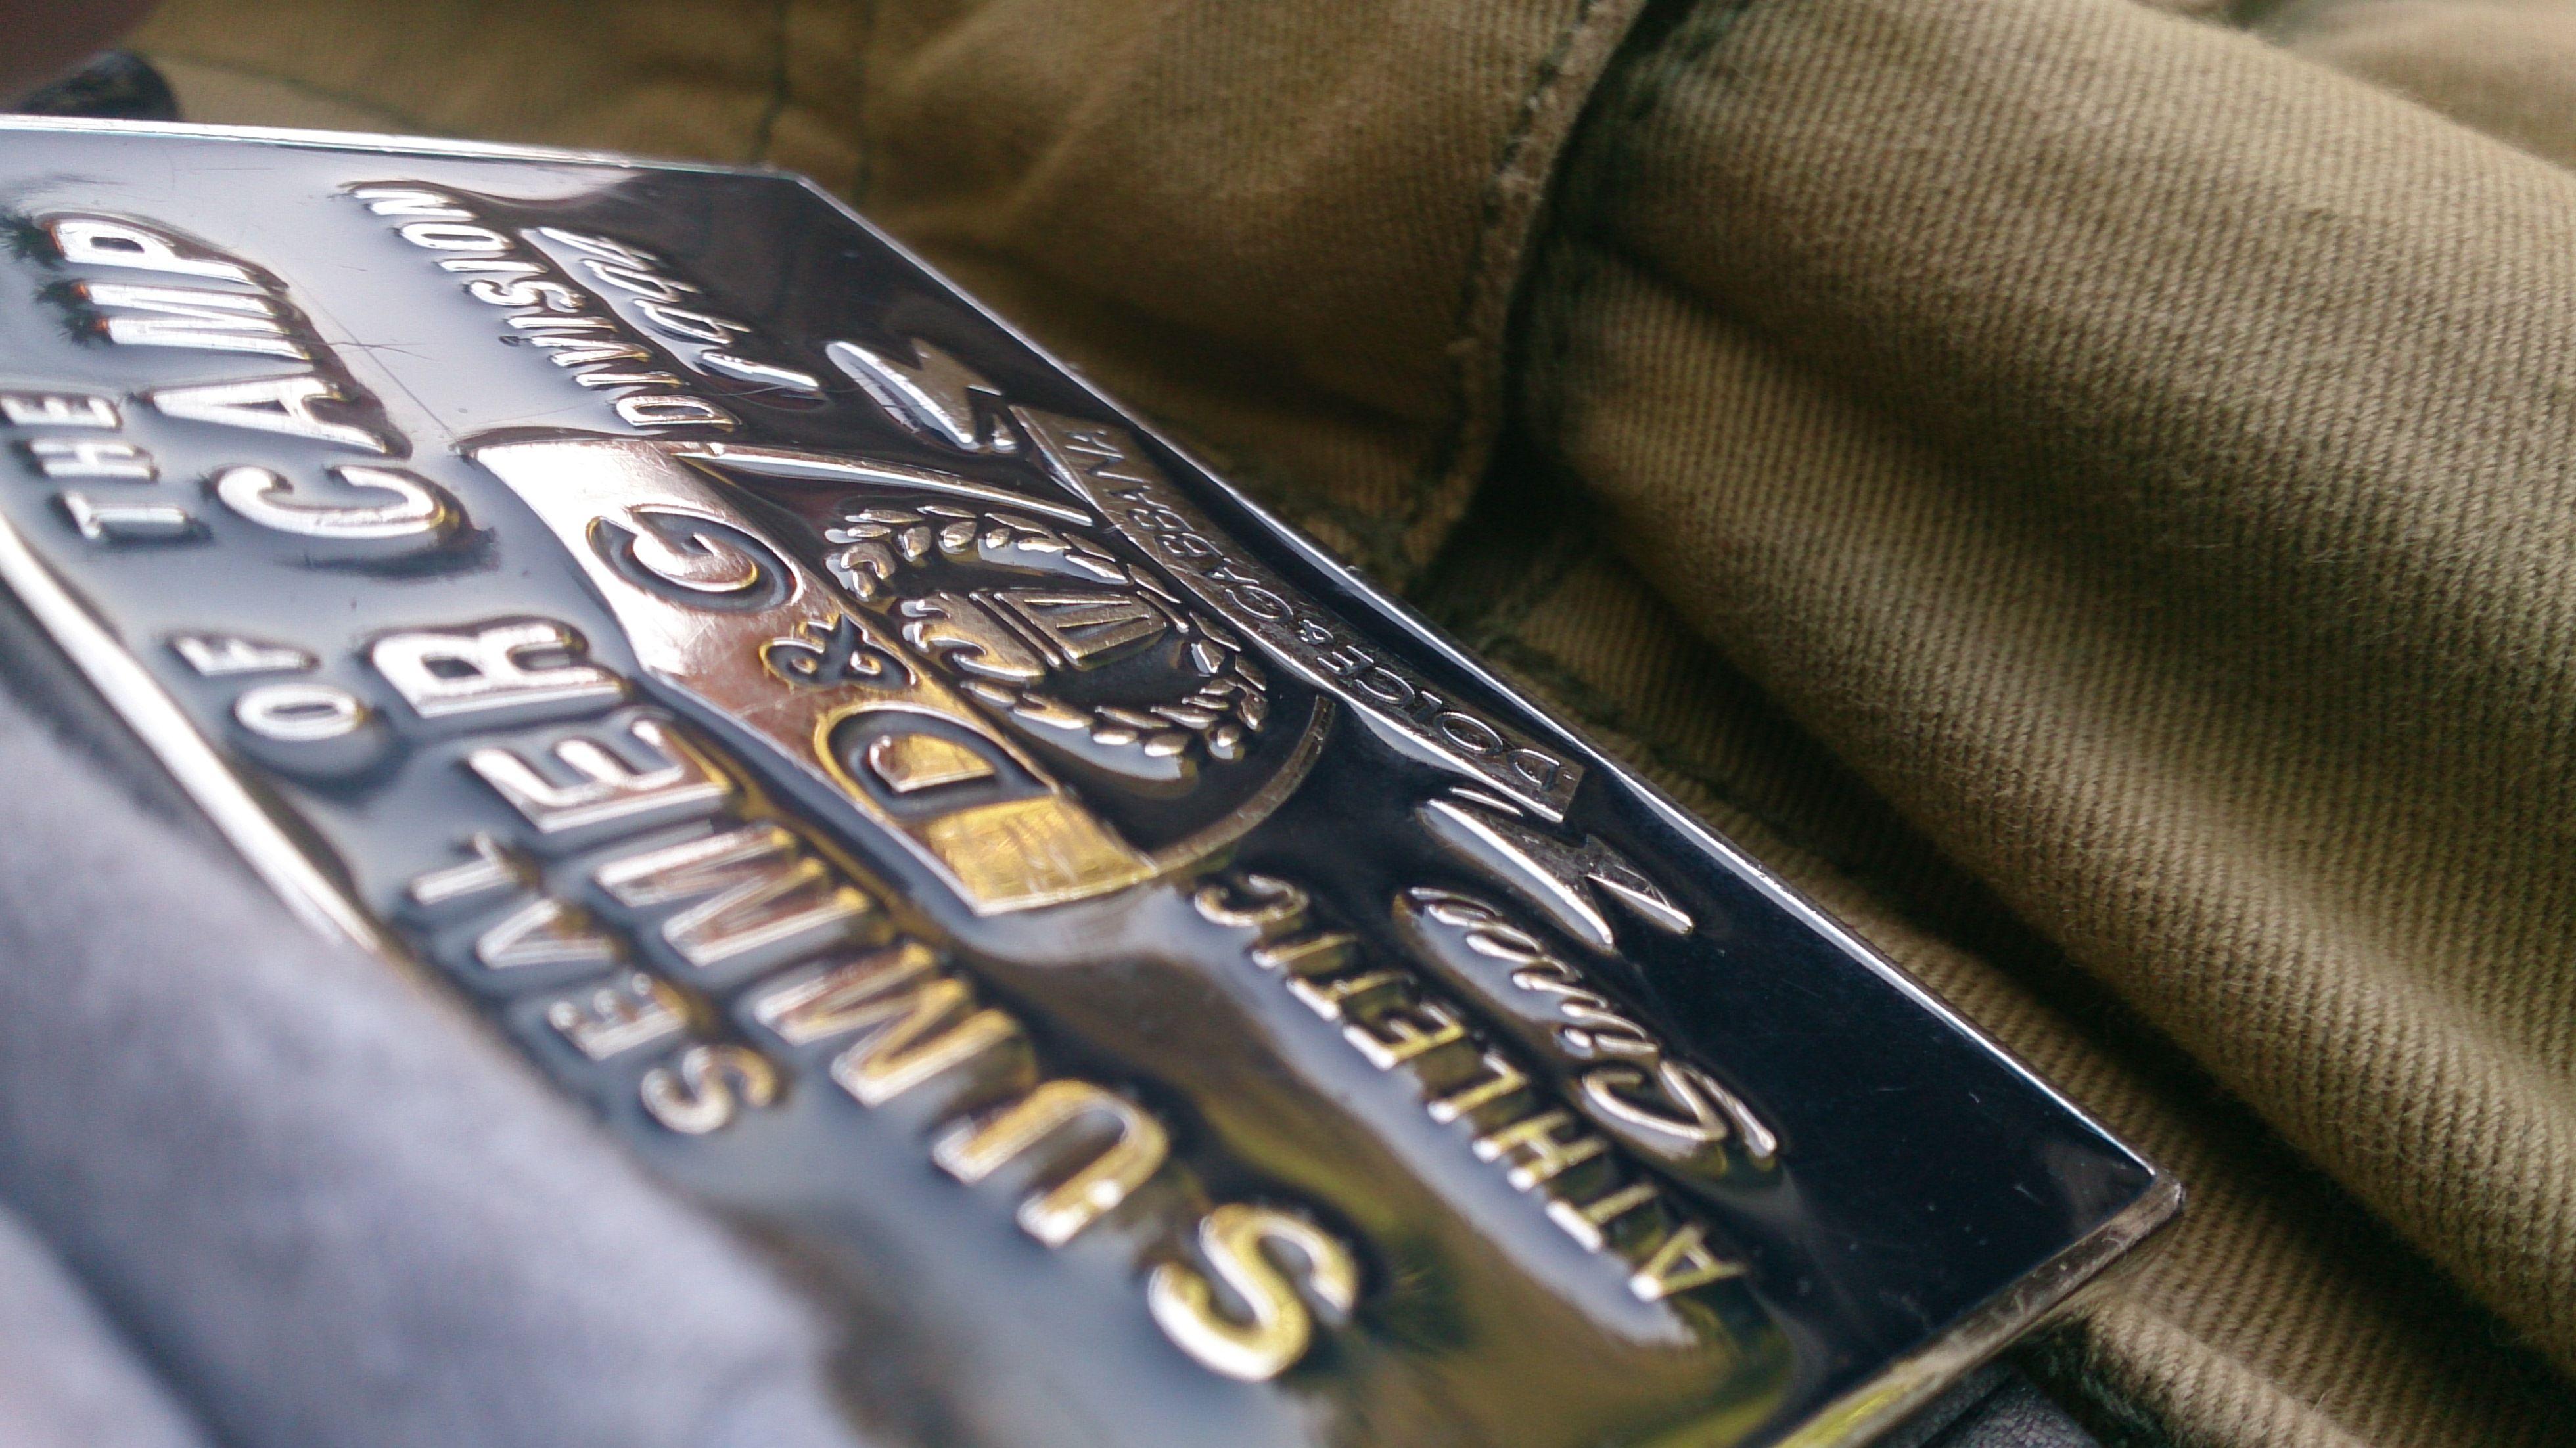 My belt